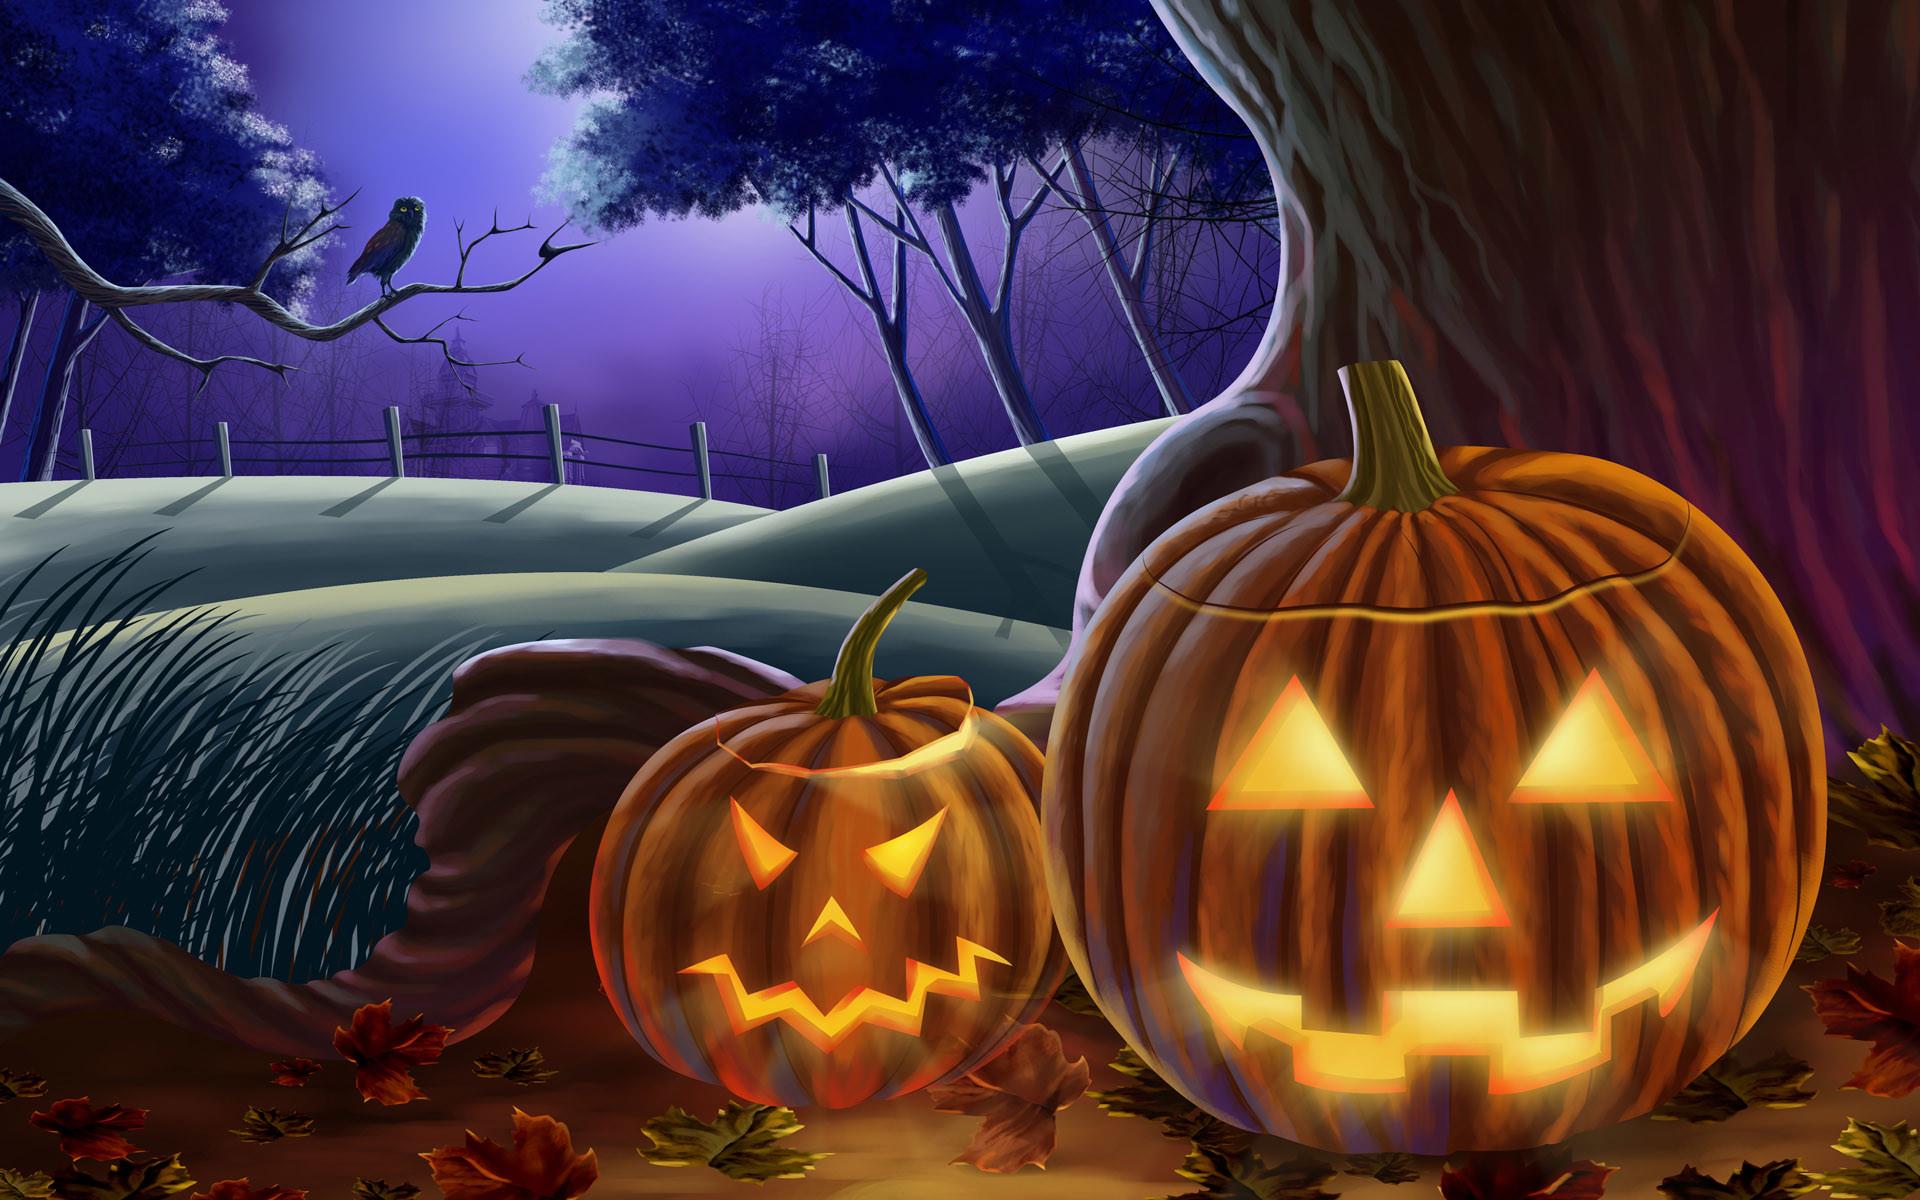 animated halloween backgrounds for desktop 16